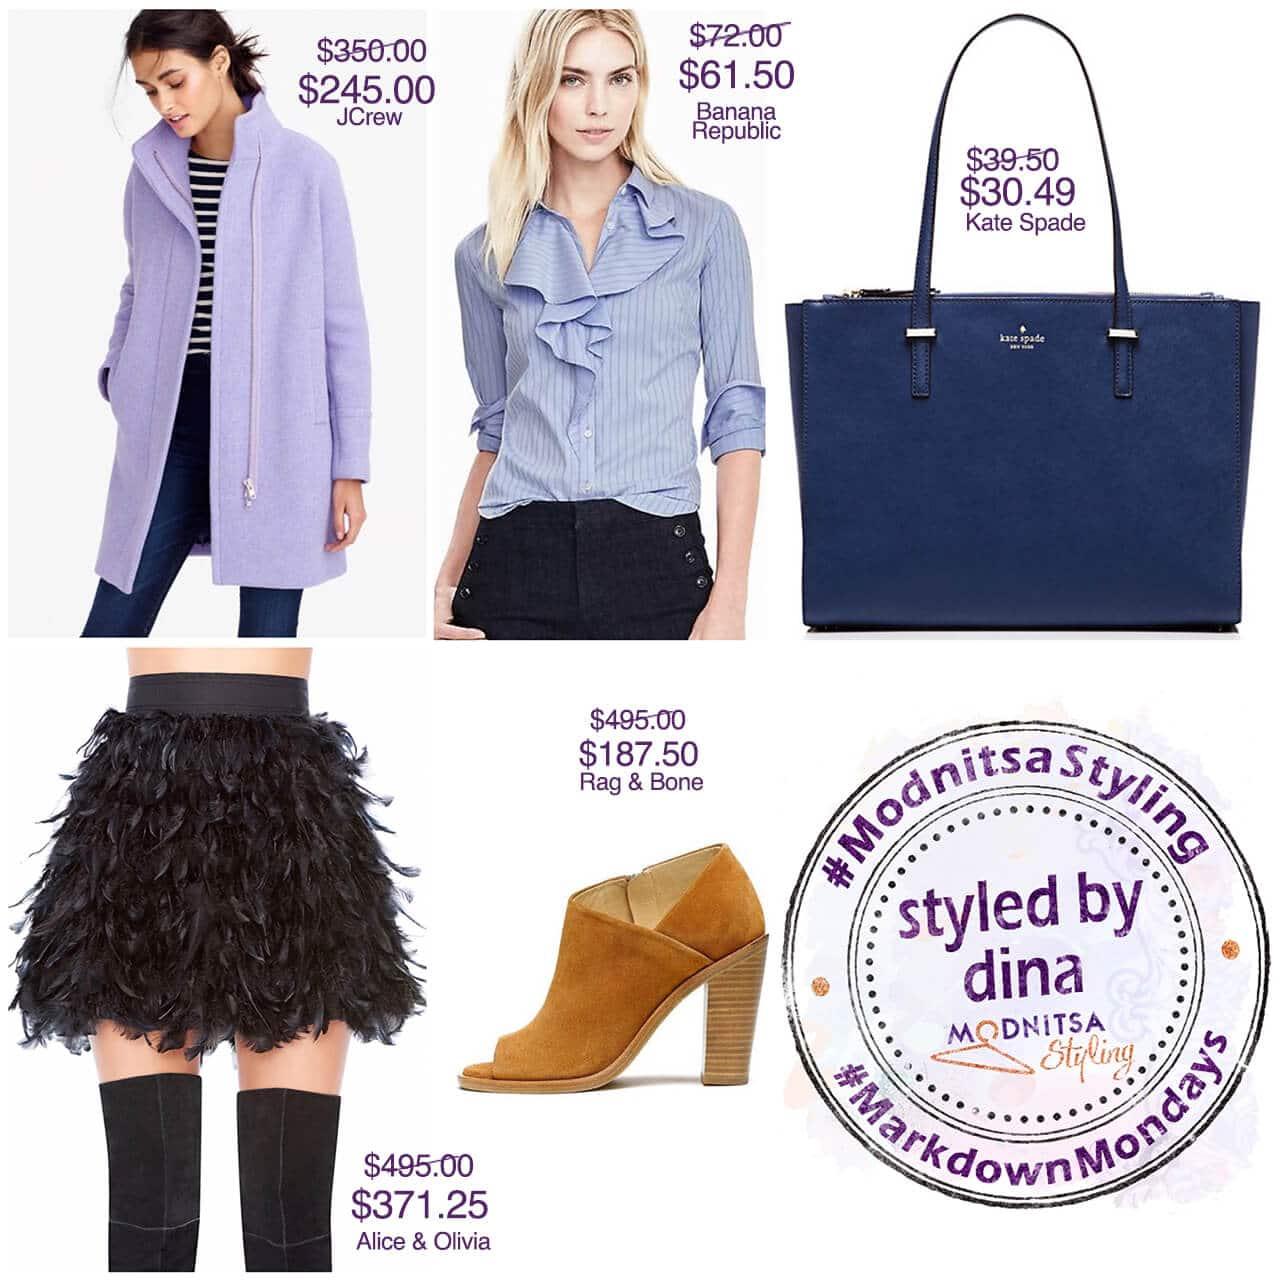 columbus day shopping sales markdown mondays collage 101016